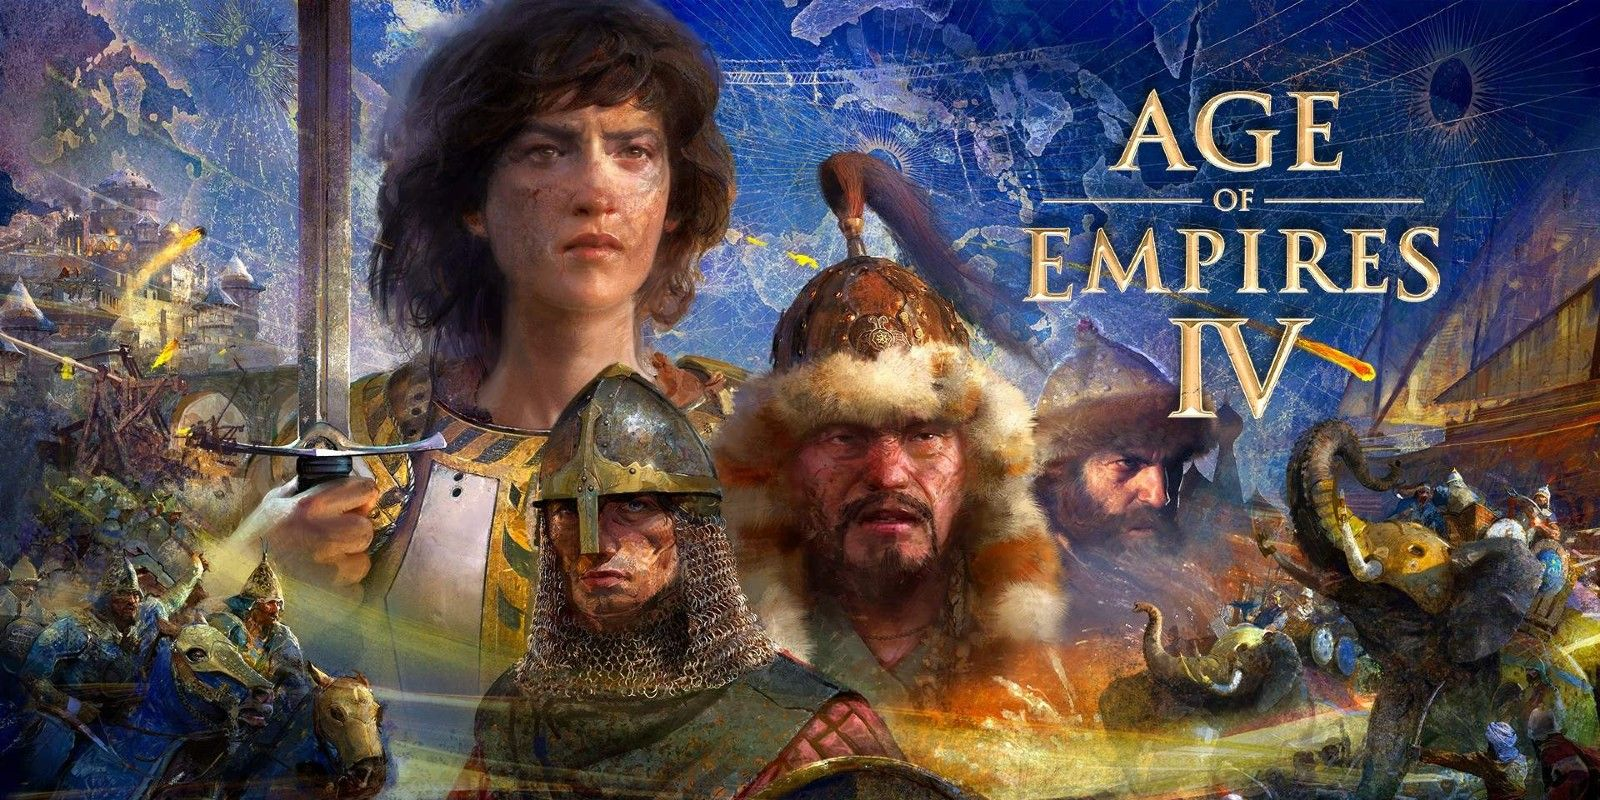 Age of Empires 4 Review: Where Nostalgia & Modernization Meet